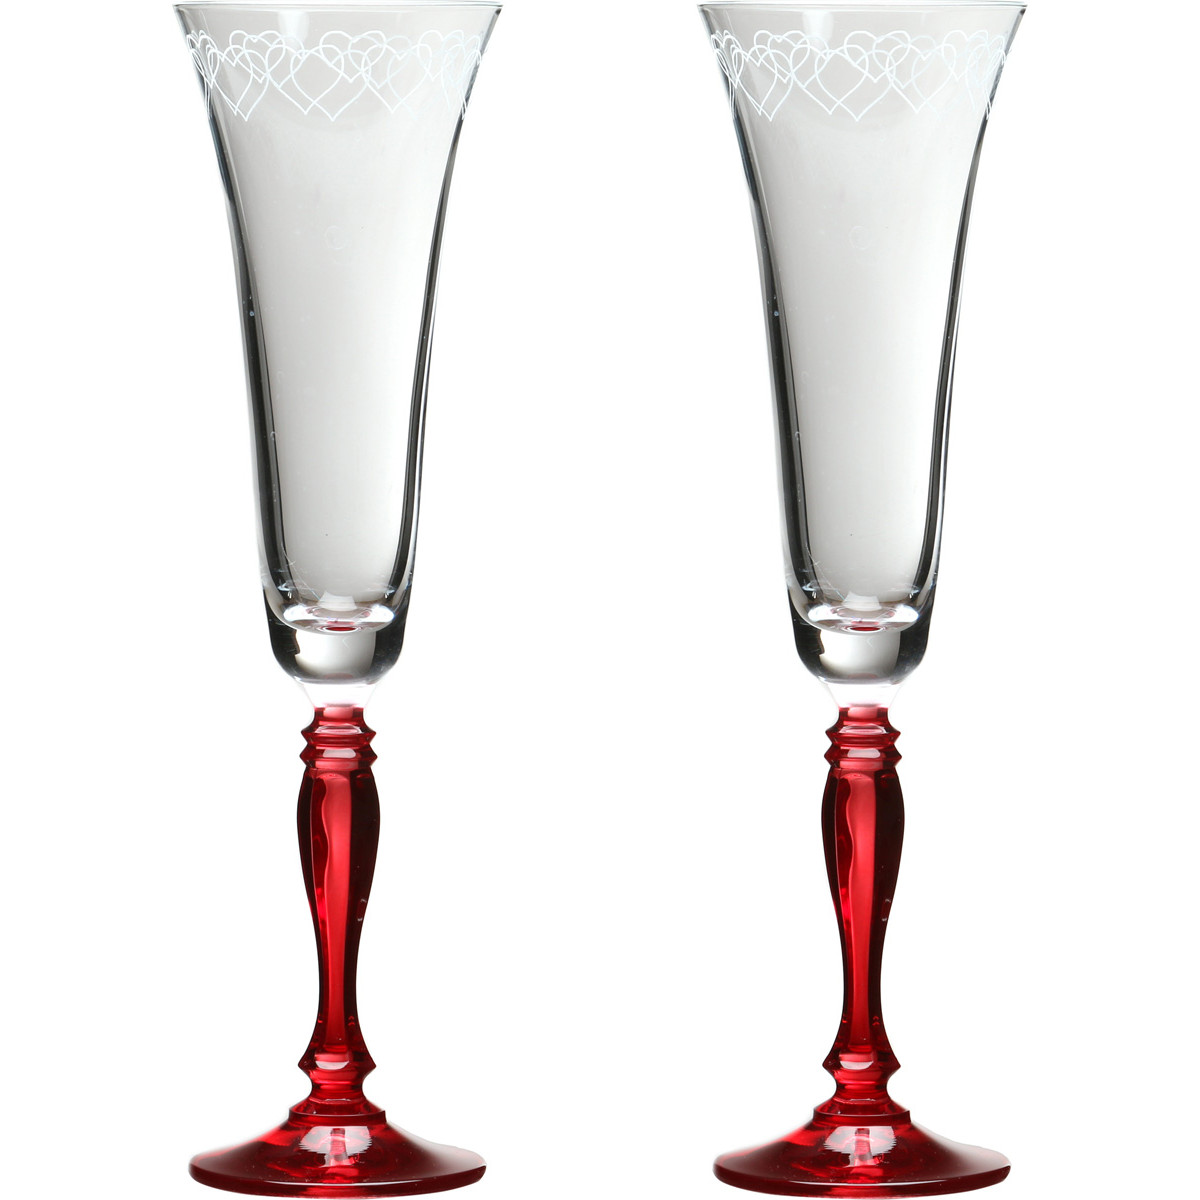 {} Bohemia Crystal Набор бокалов для шампанского Boaz  (25 см - 2 шт) crystal bohemia